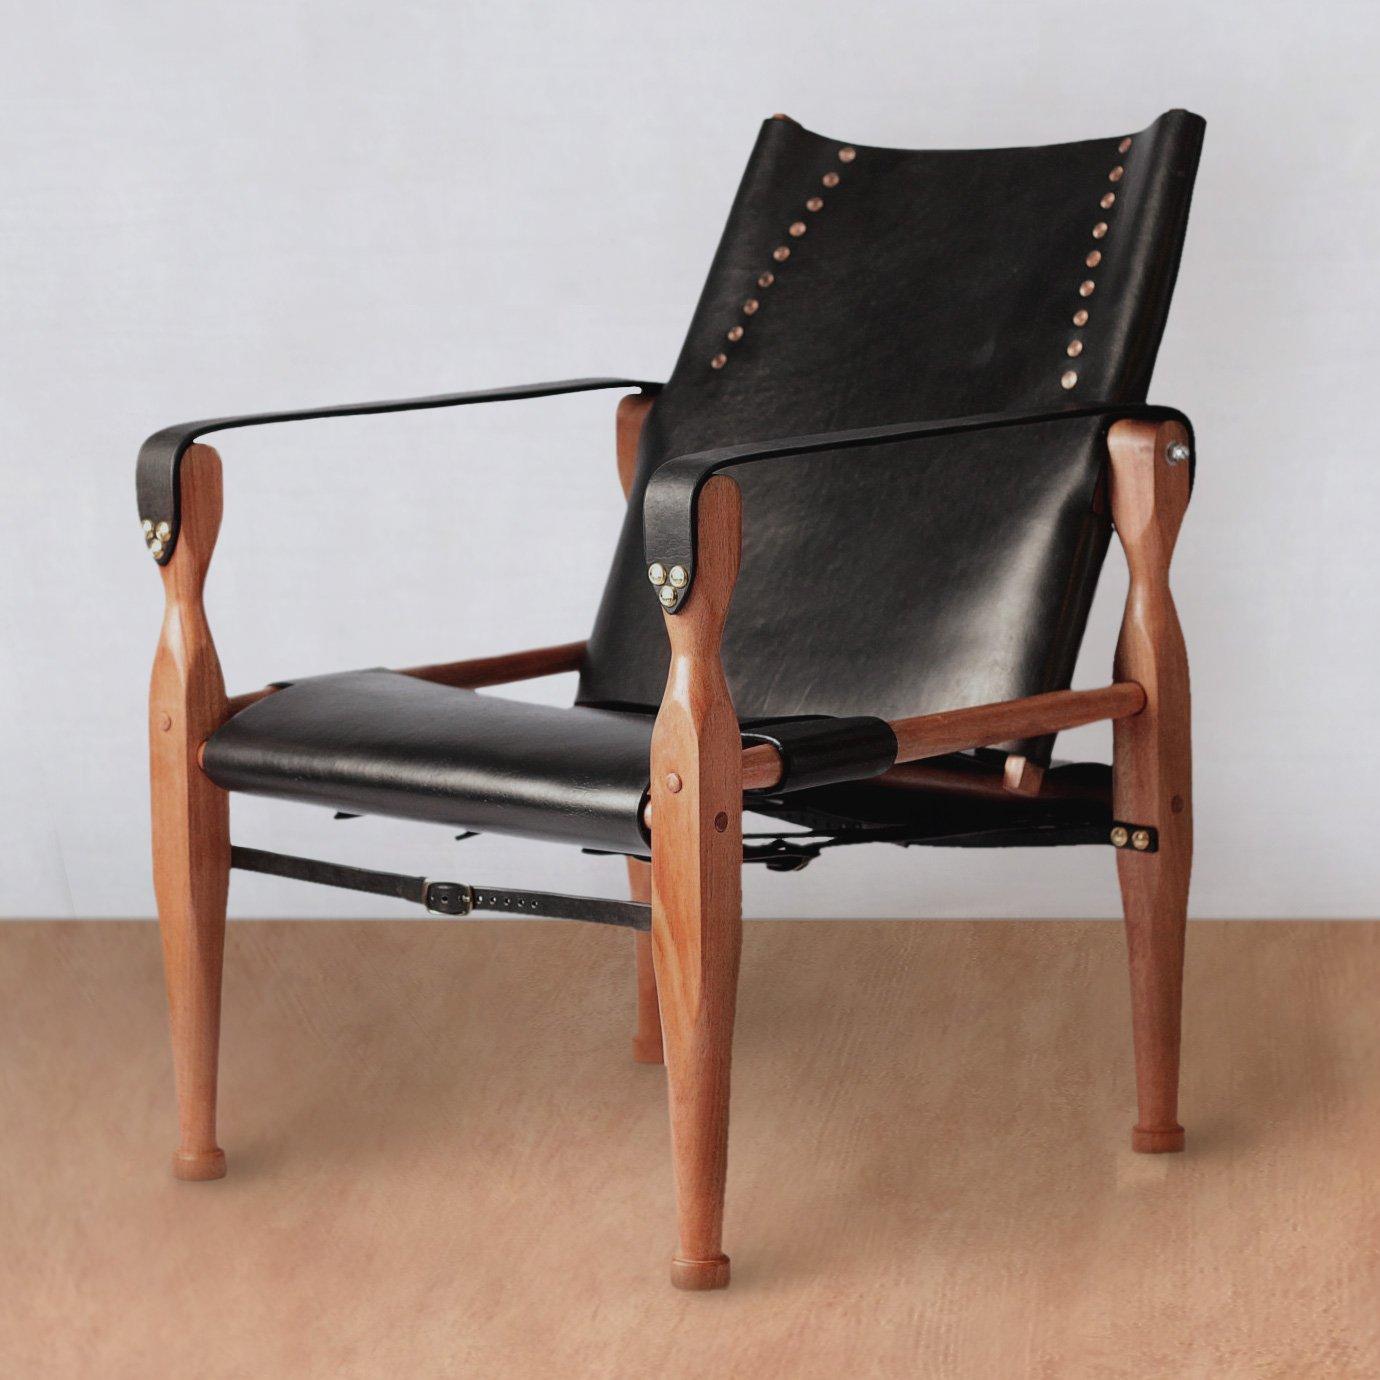 Bespoke Leather Campaign Safari Roorkhee Wood Chair